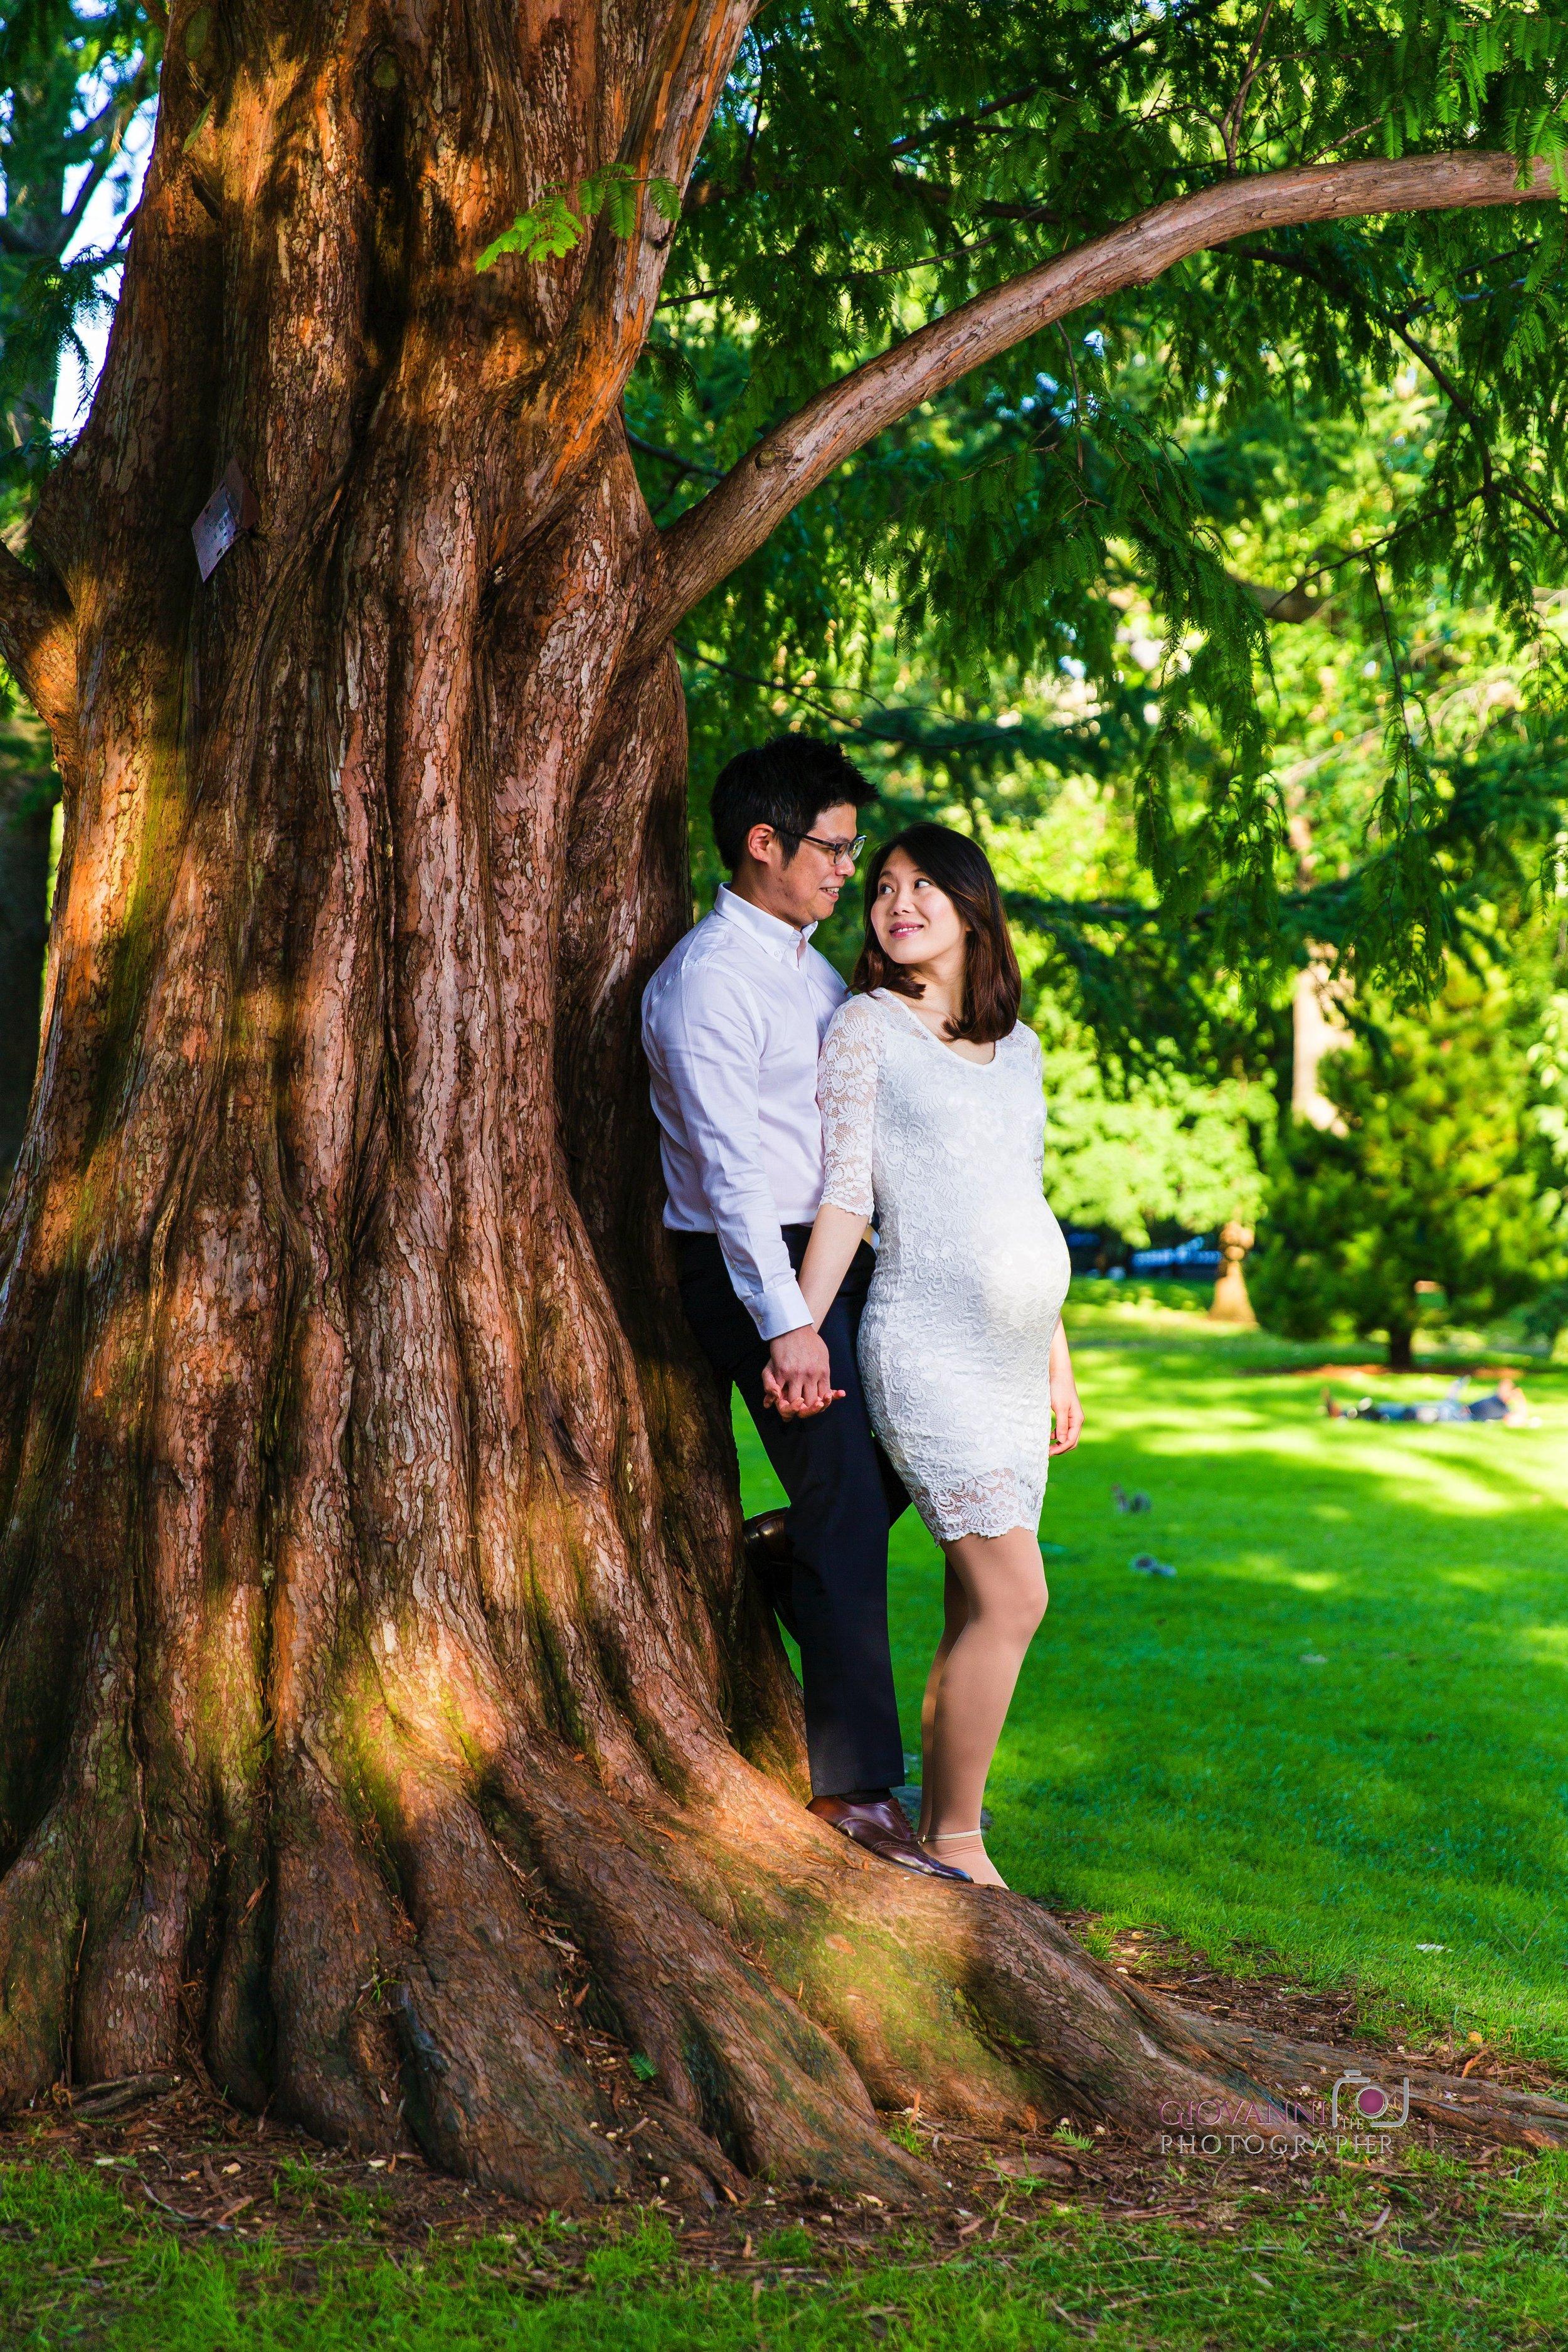 8C2A5882 Giovanni The Photographer Best Boston Maternity New Born Photography Public Garden - Common WM100.jpg